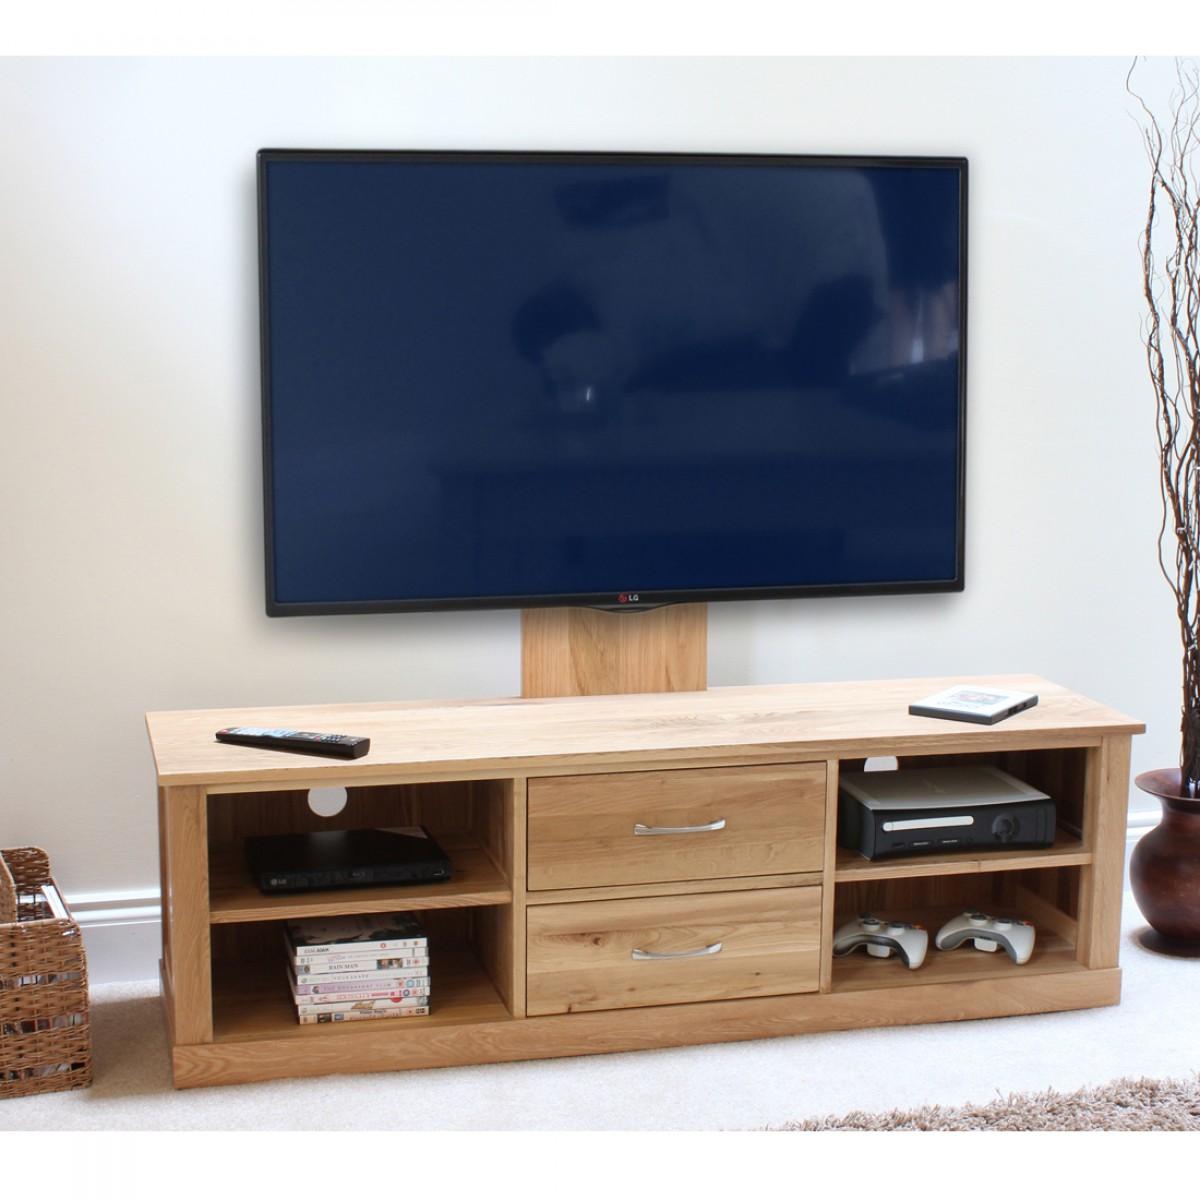 details about baumhaus mobel oak widescreen tv cabinet mounted adjustable bracket solid oak